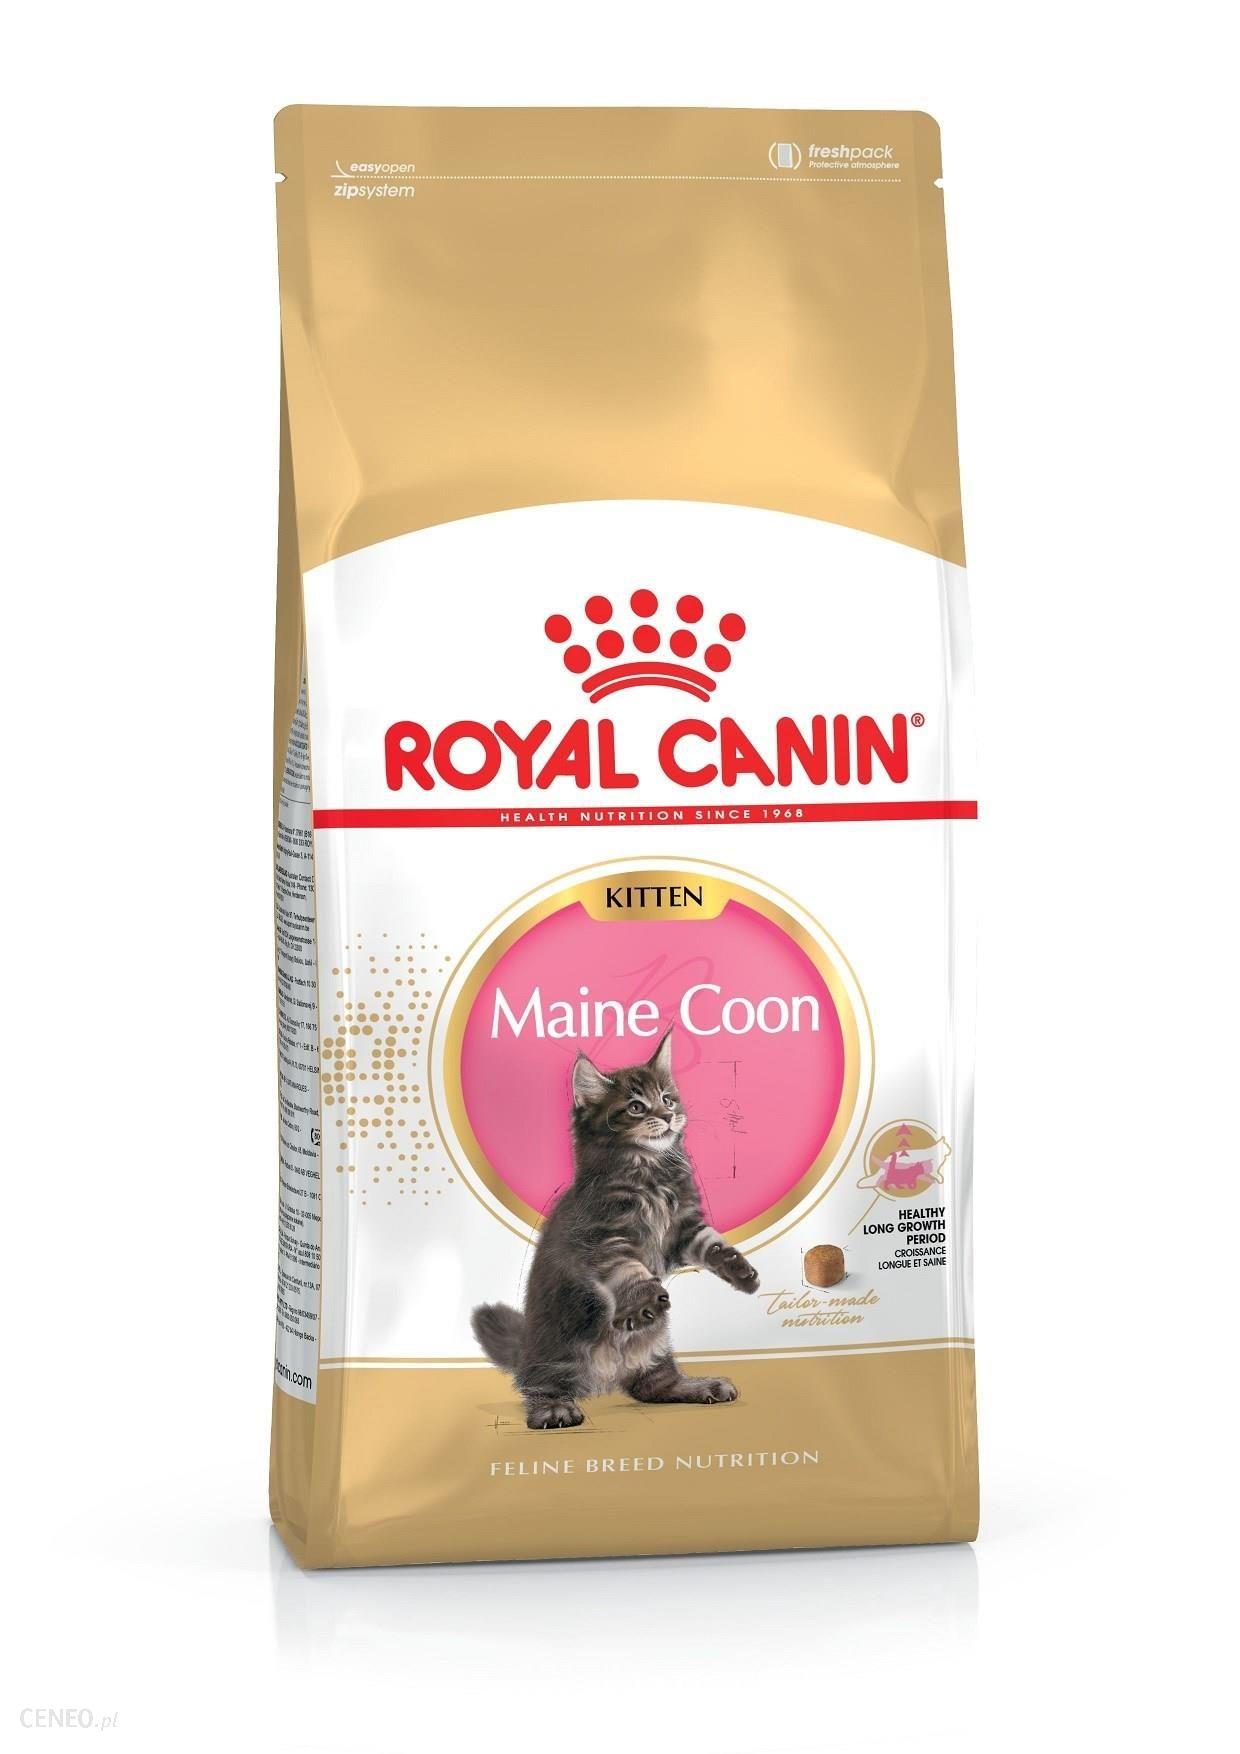 Royal Canin Maine Coon Kitten 2x10kg